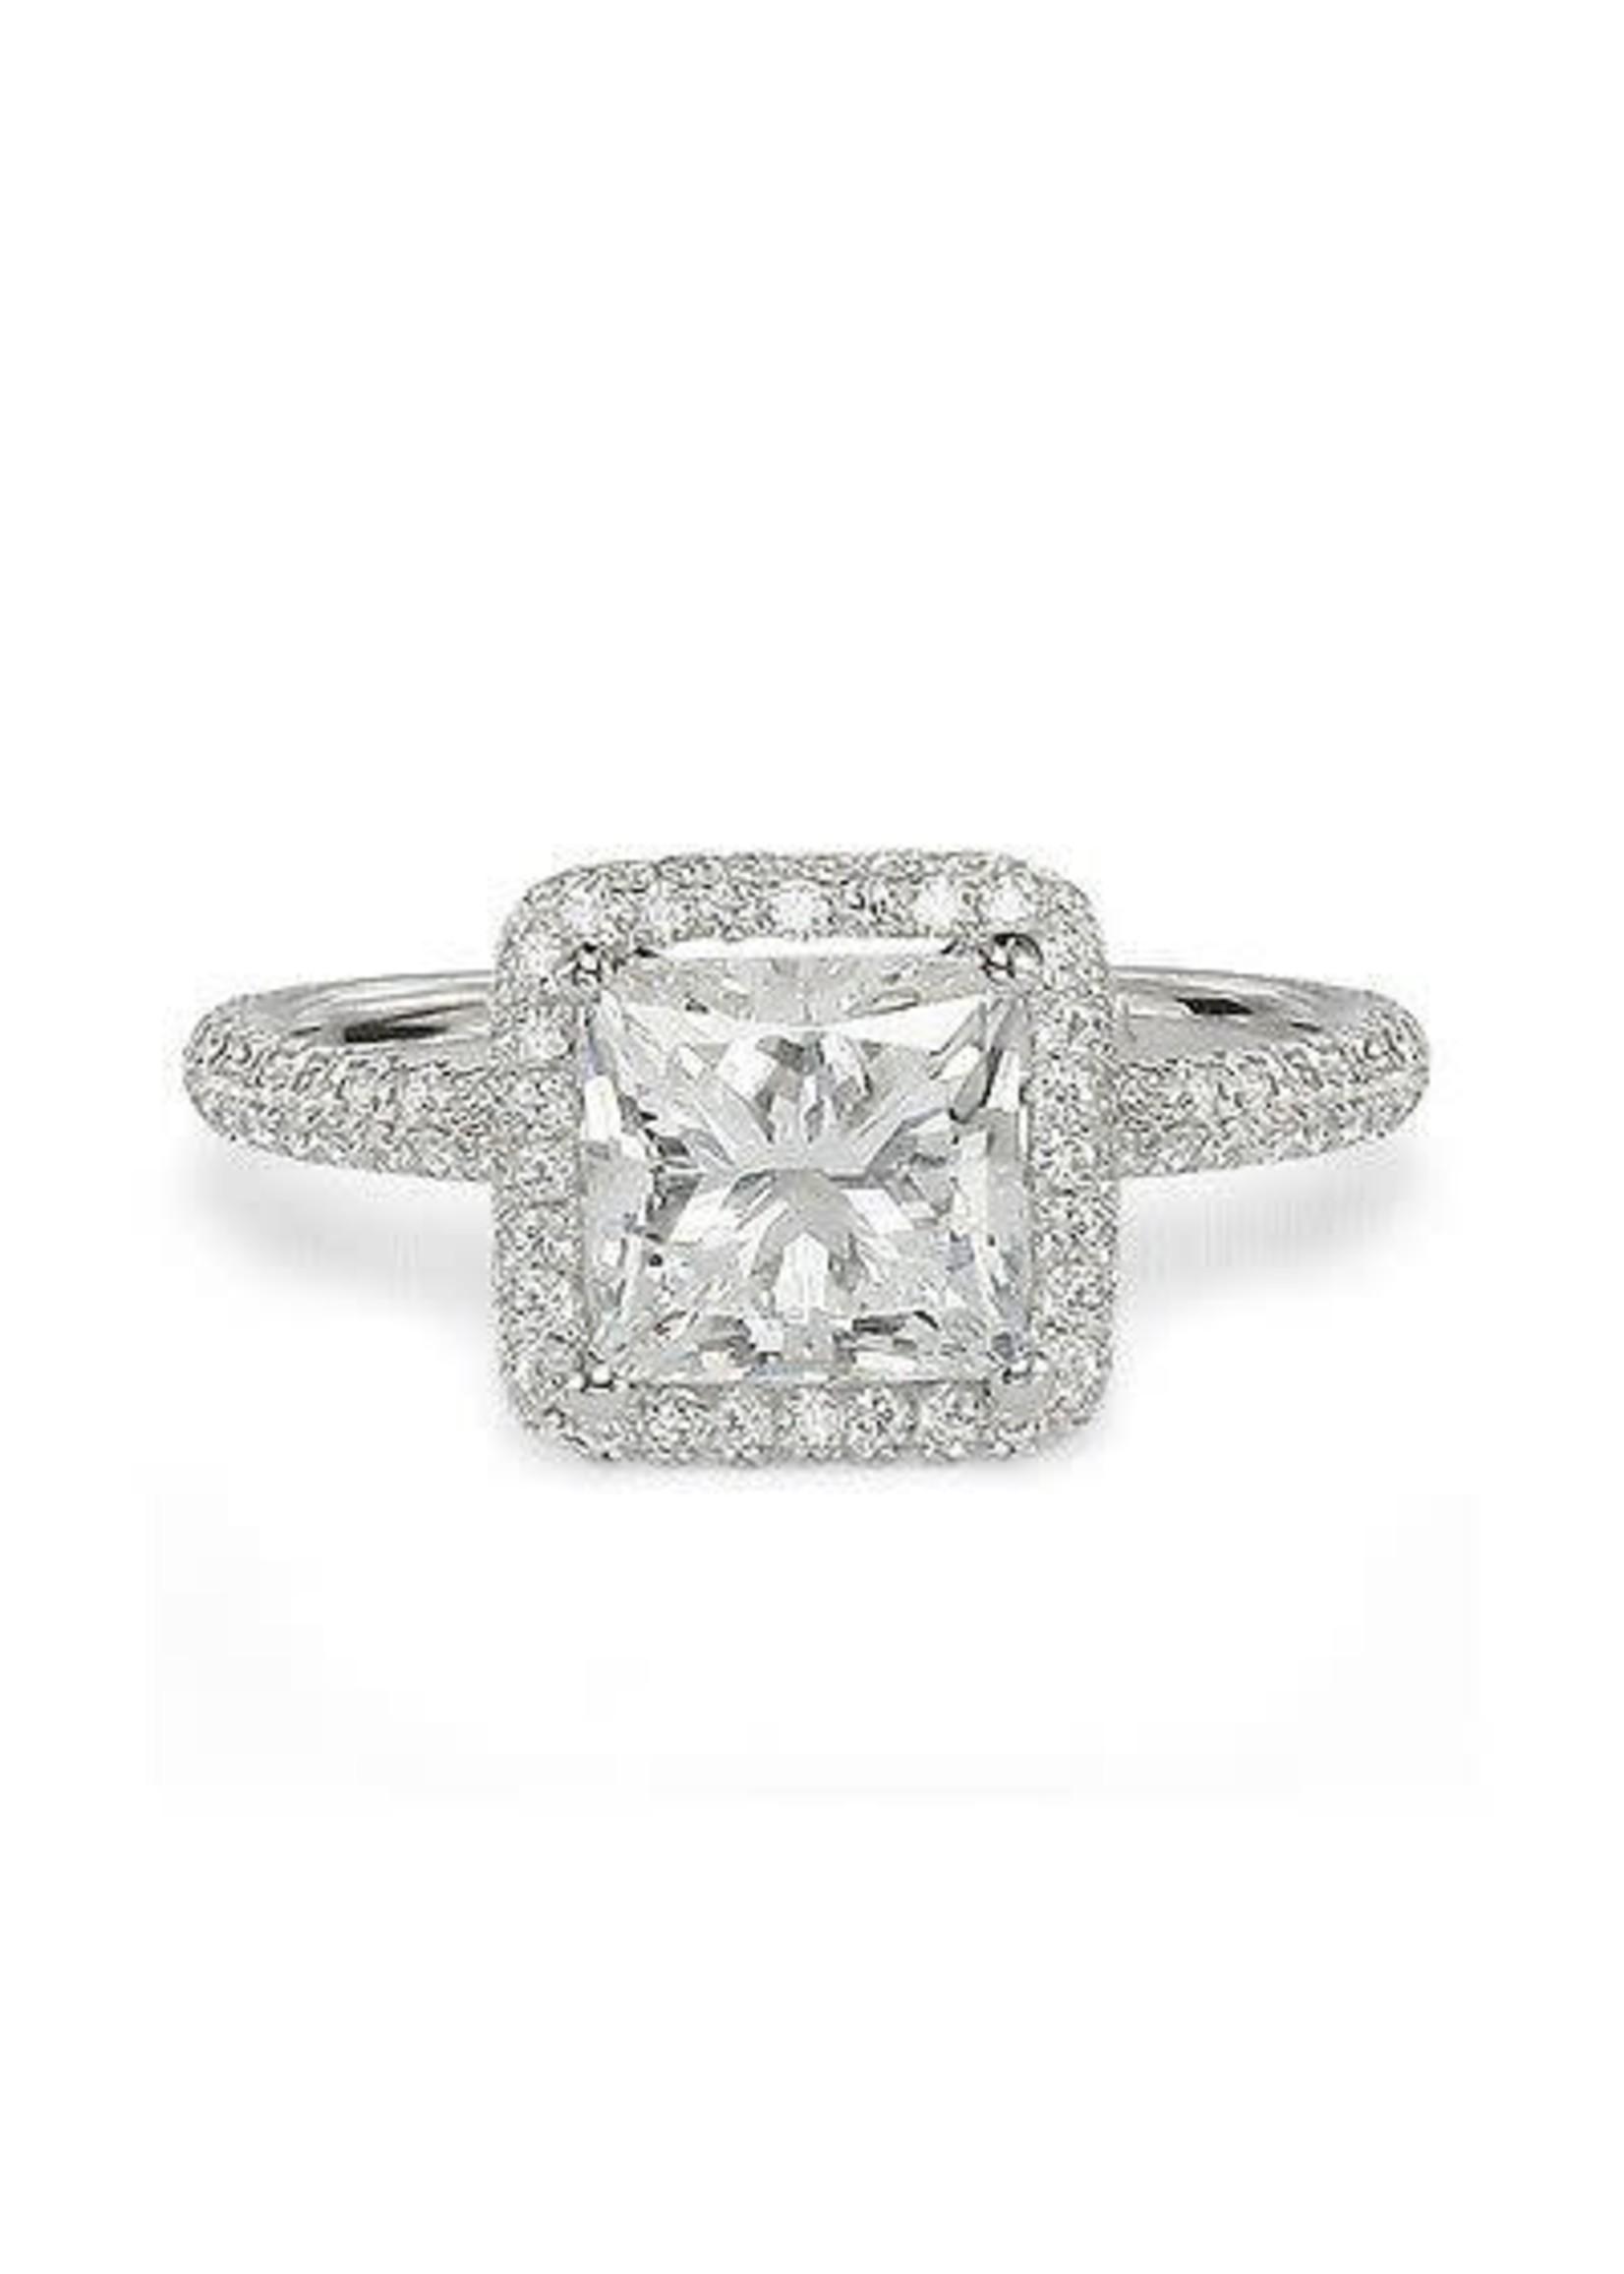 Diamond 1.33 Carat Radiant Loose Diamond, j, SI1,  Certified